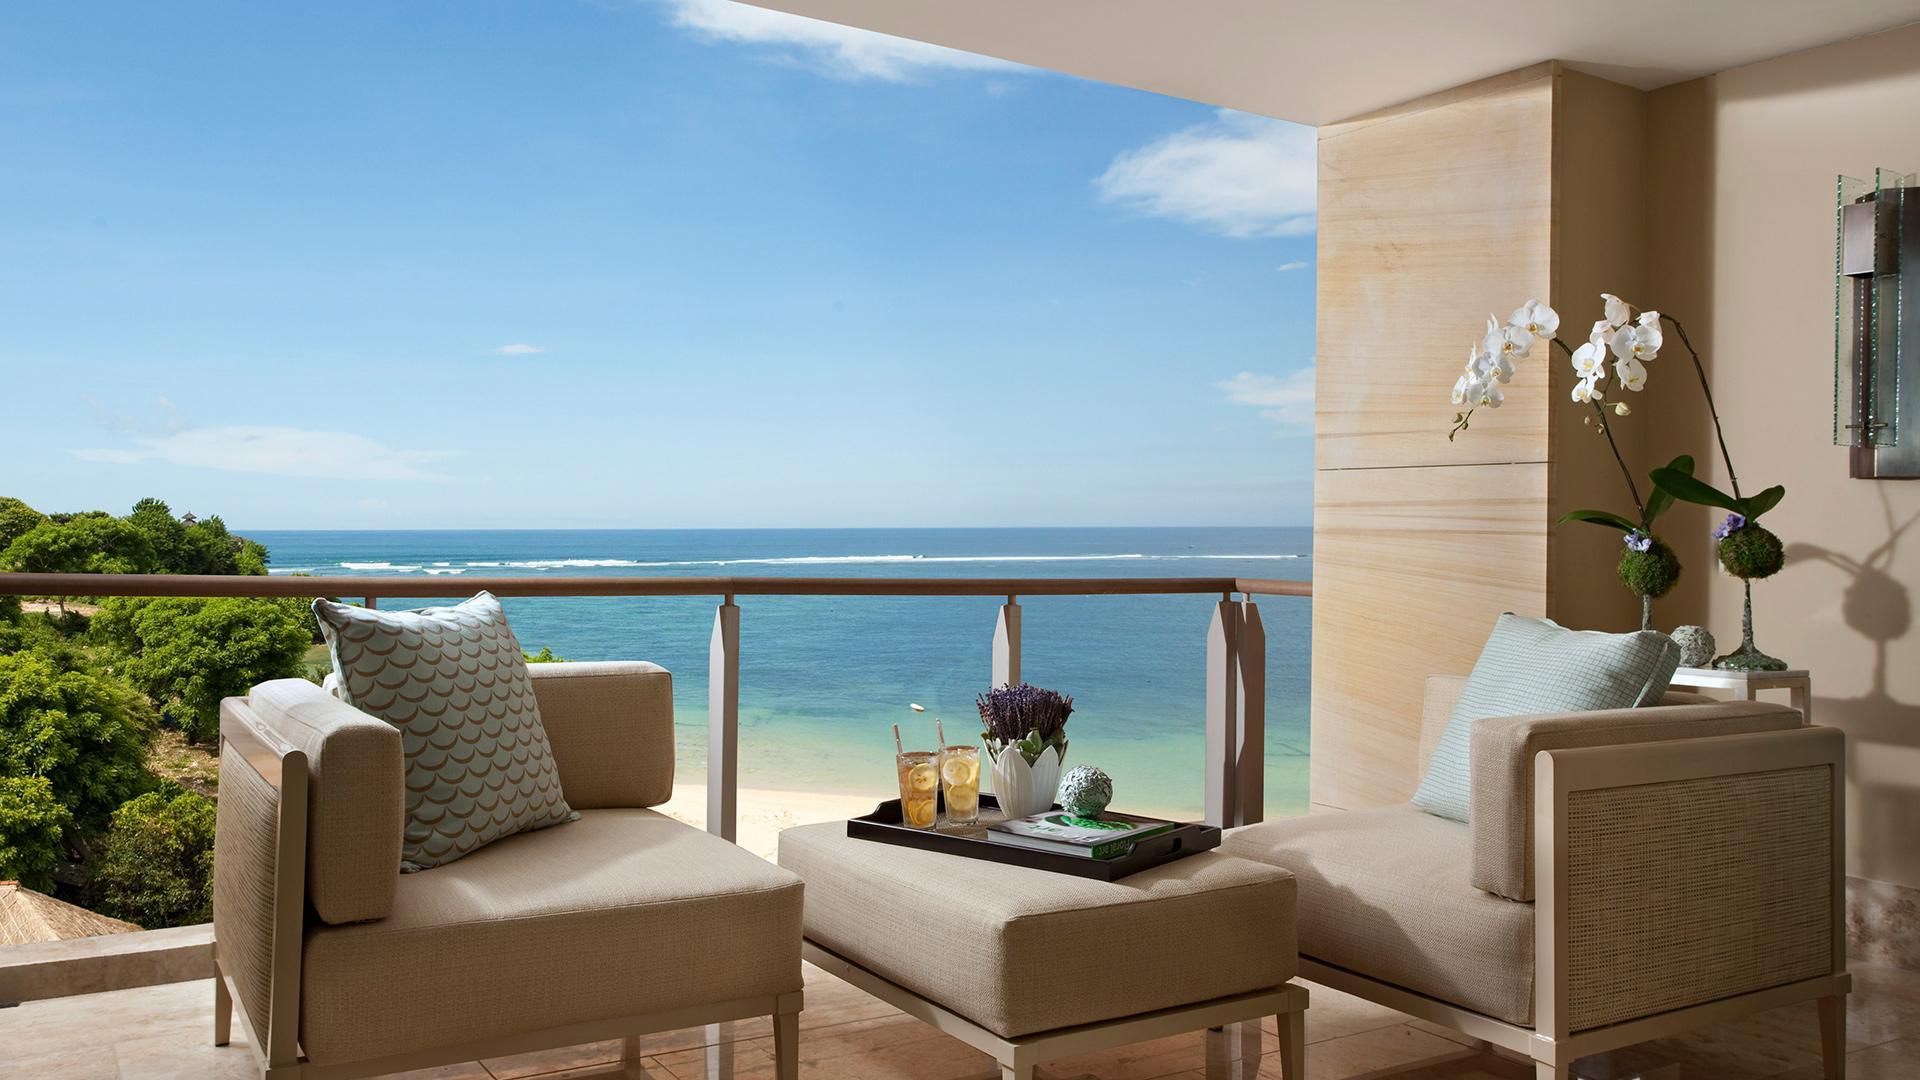 Royal Suite Ocean Court – Family image 1 at Mulia Resort May 2021 by Kabupaten Badung, Bali, Indonesia